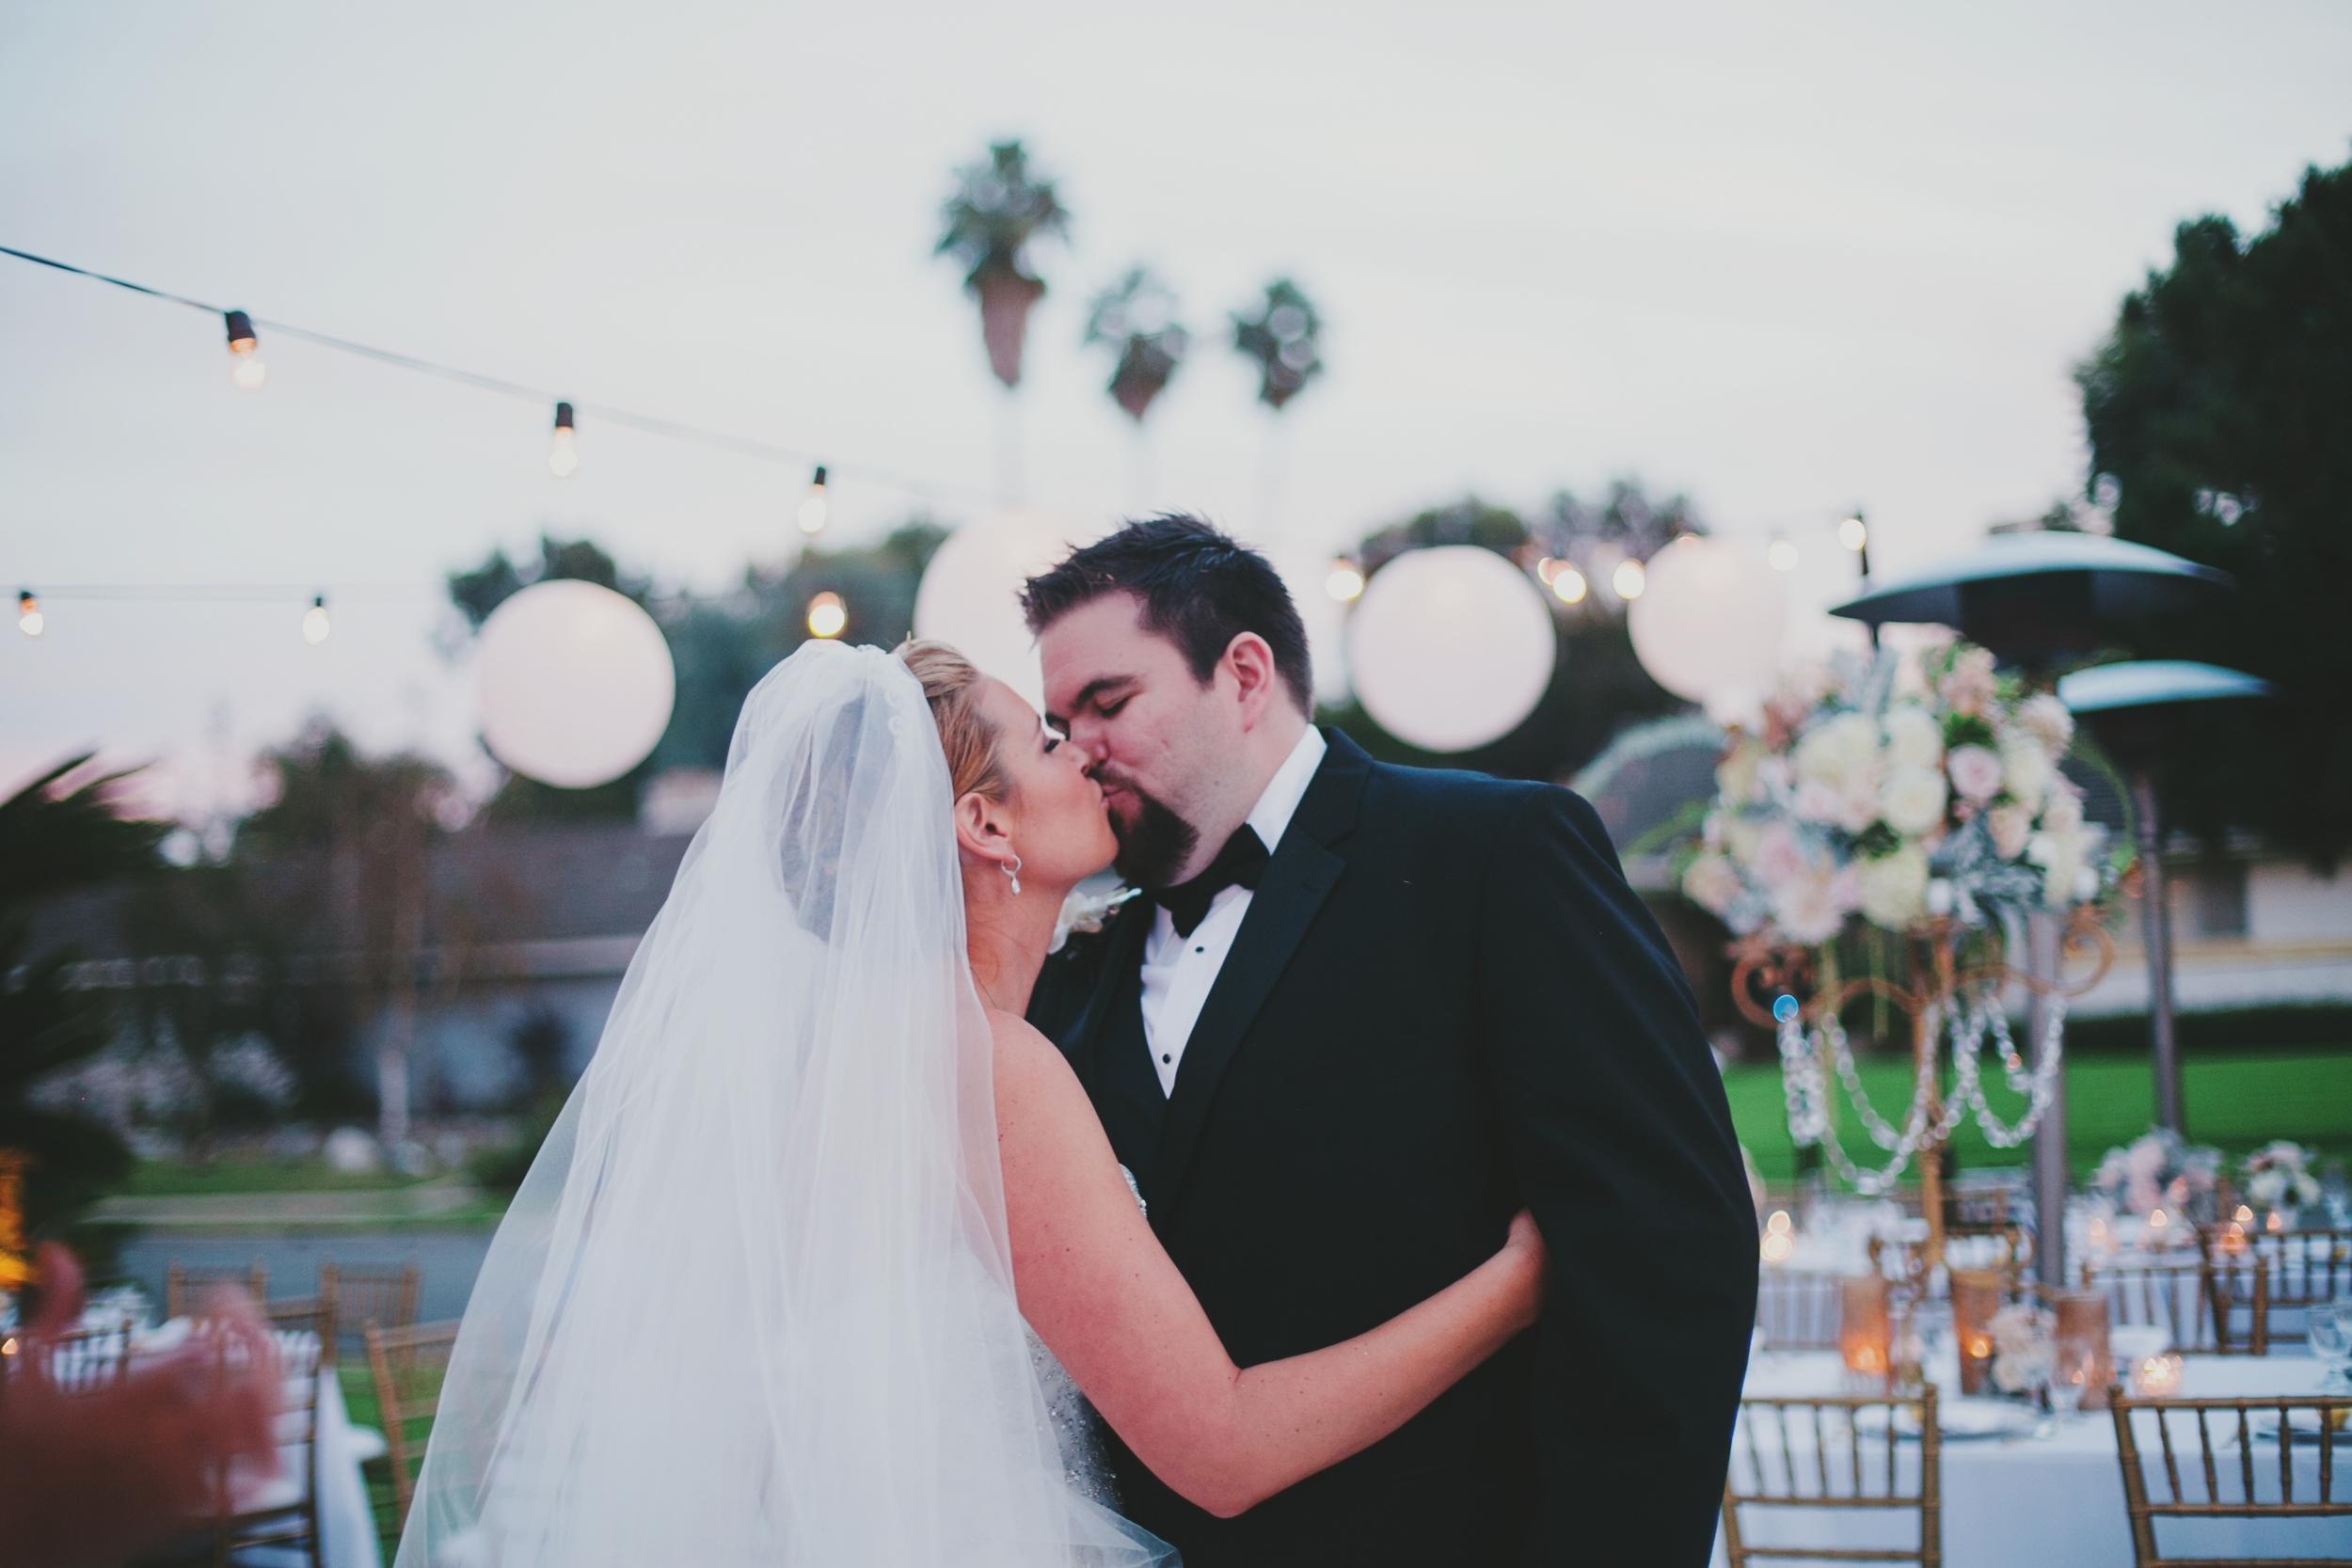 The-Suitcase-Studio-Timree-Matt-Lifestyle-Wedding-Photographer-069.jpg